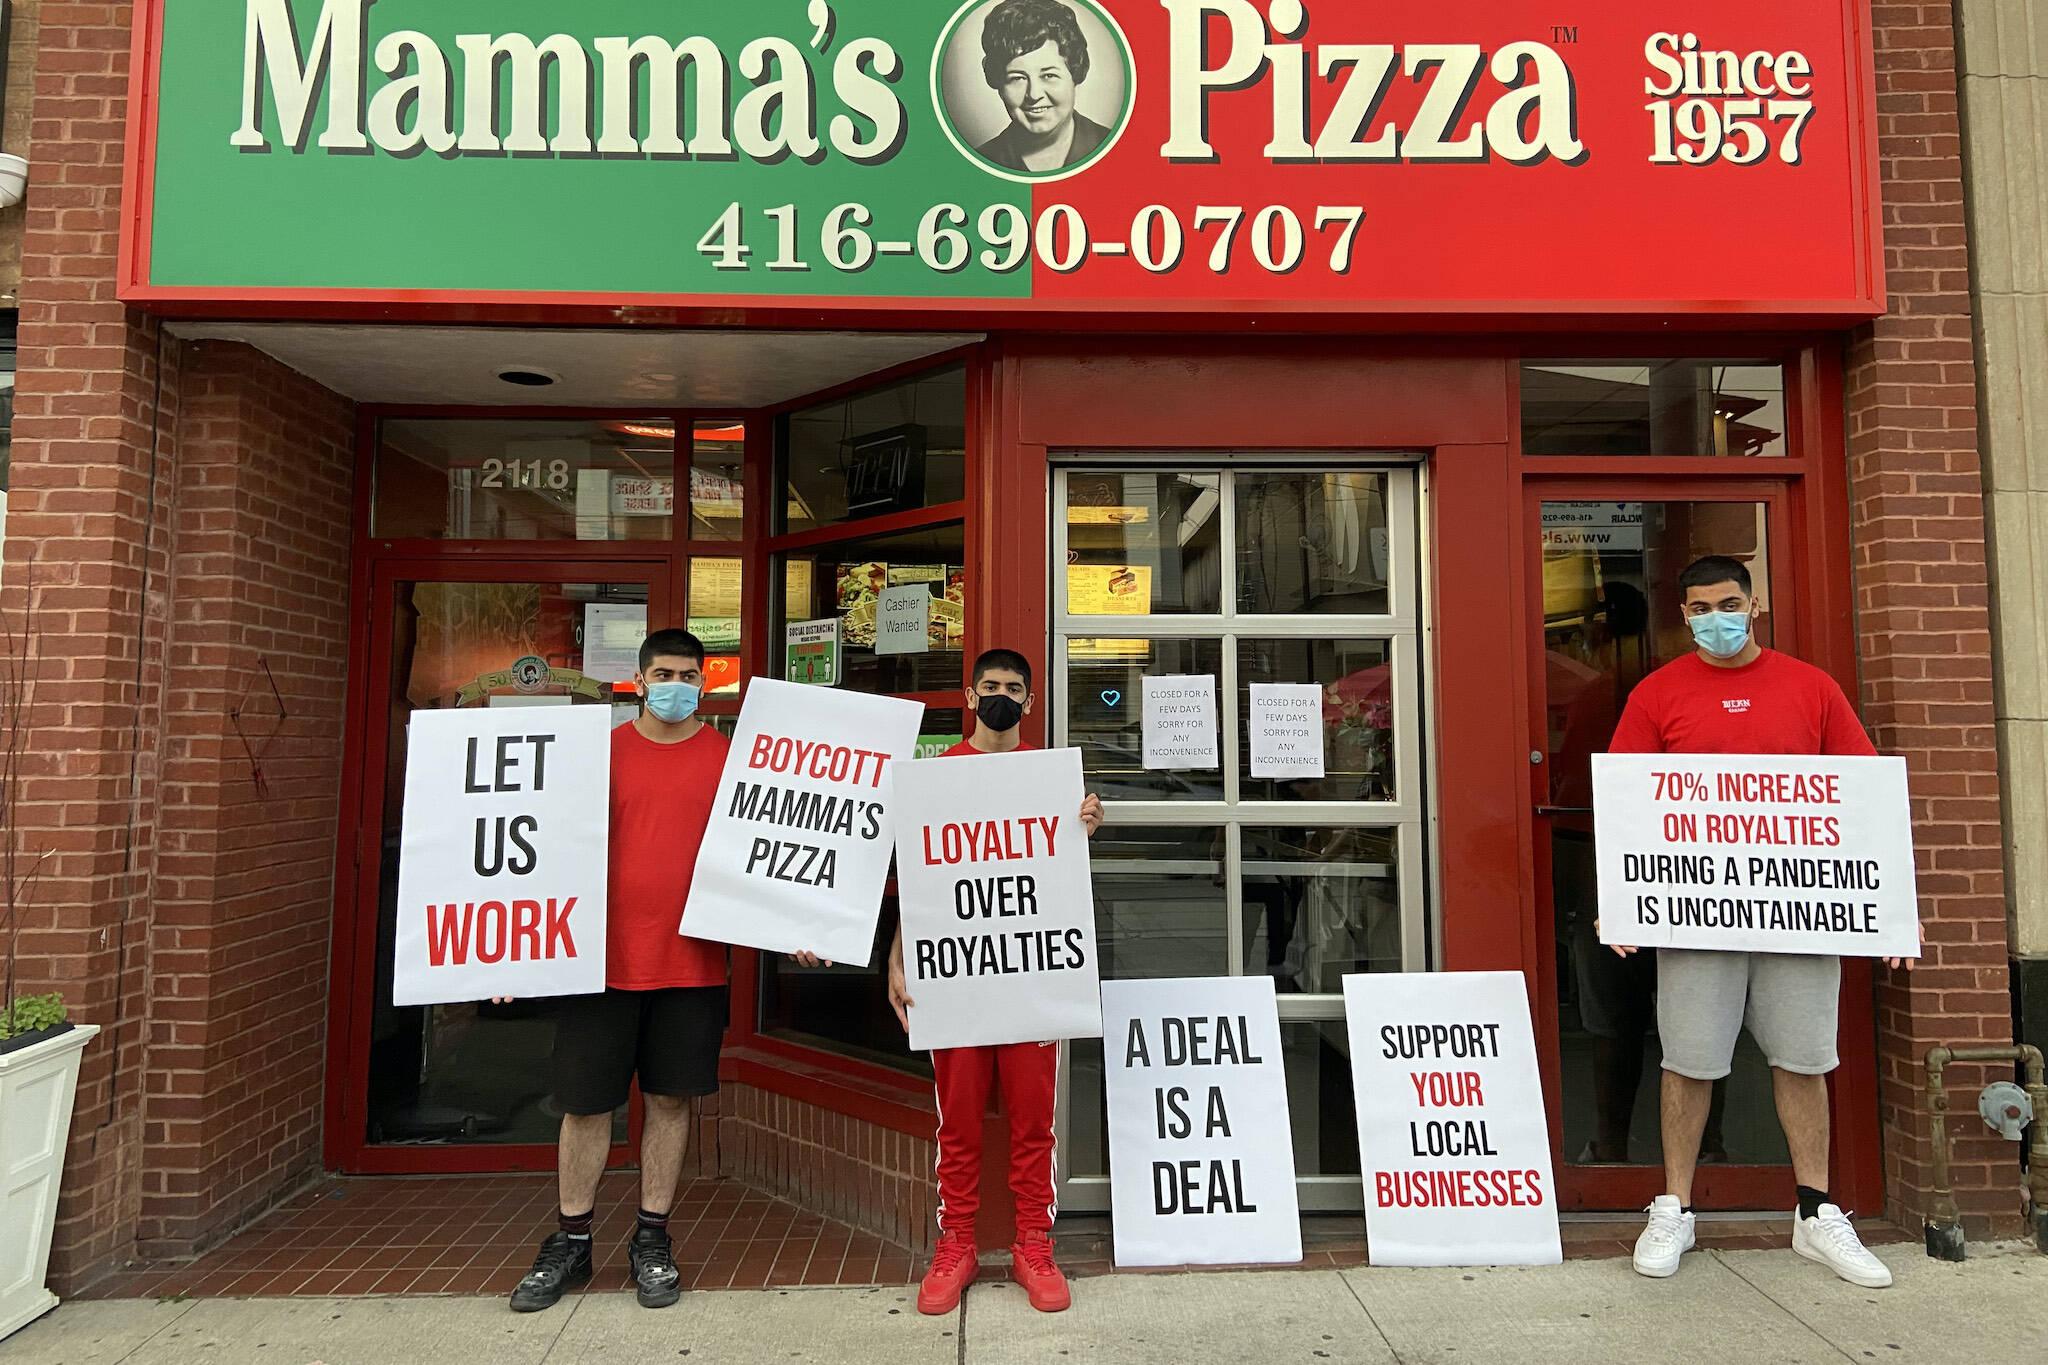 mammas pizza Toronto